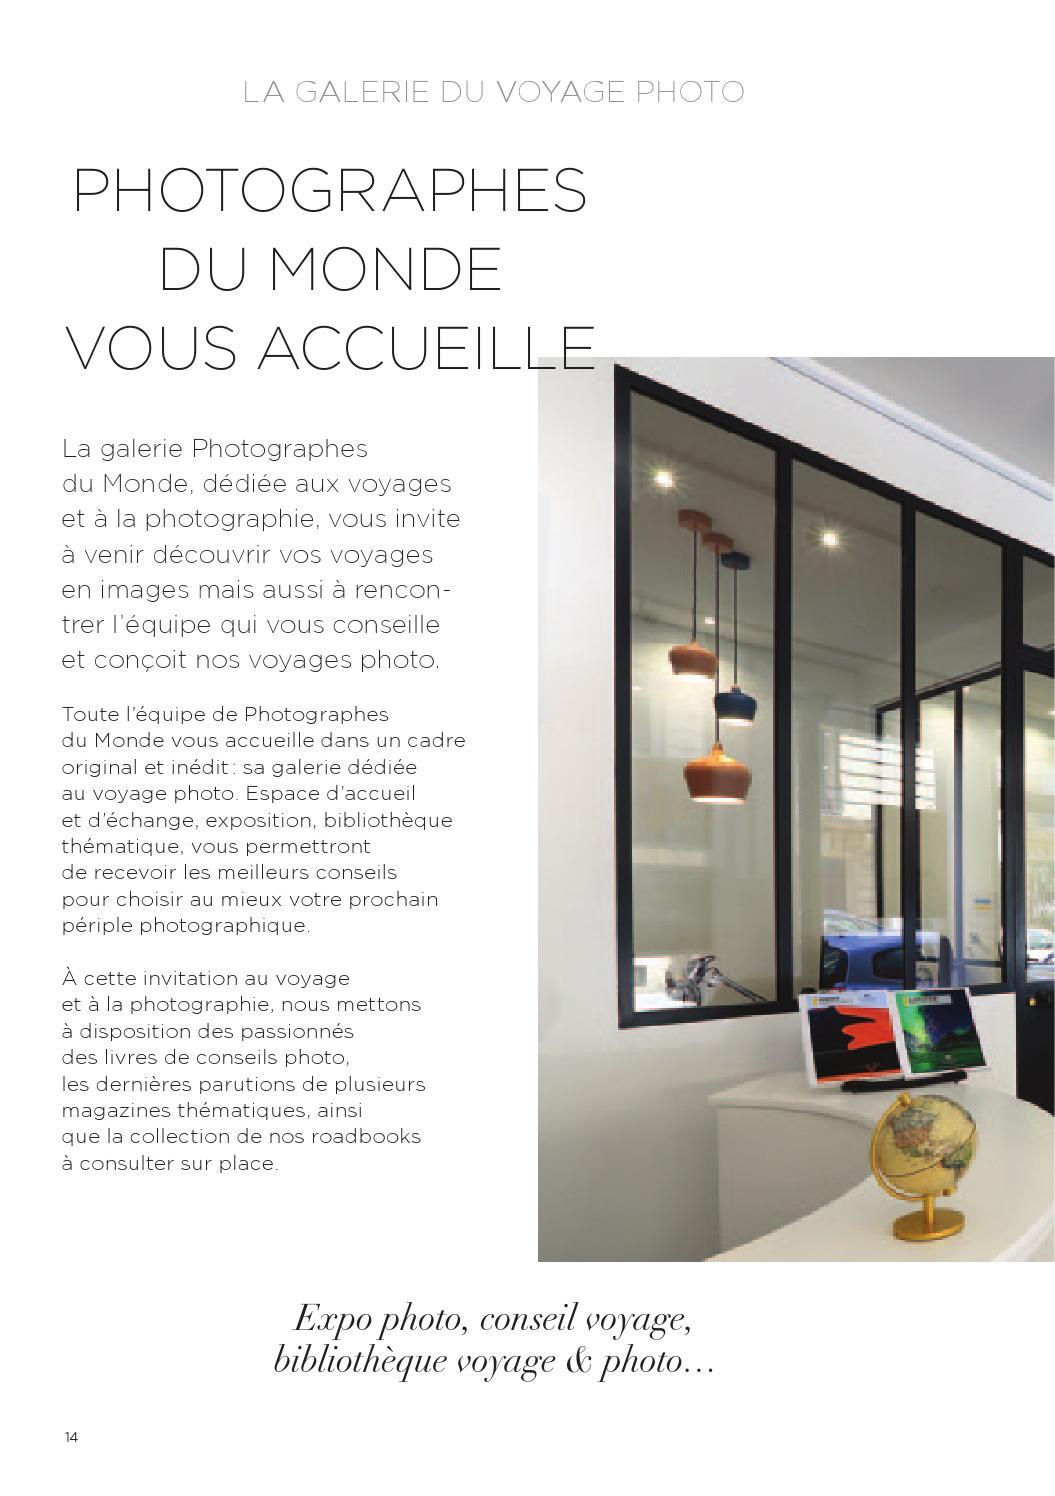 Cadre Original Pour Plusieurs Photos photographes du monde : catalogue 2016   vebuka